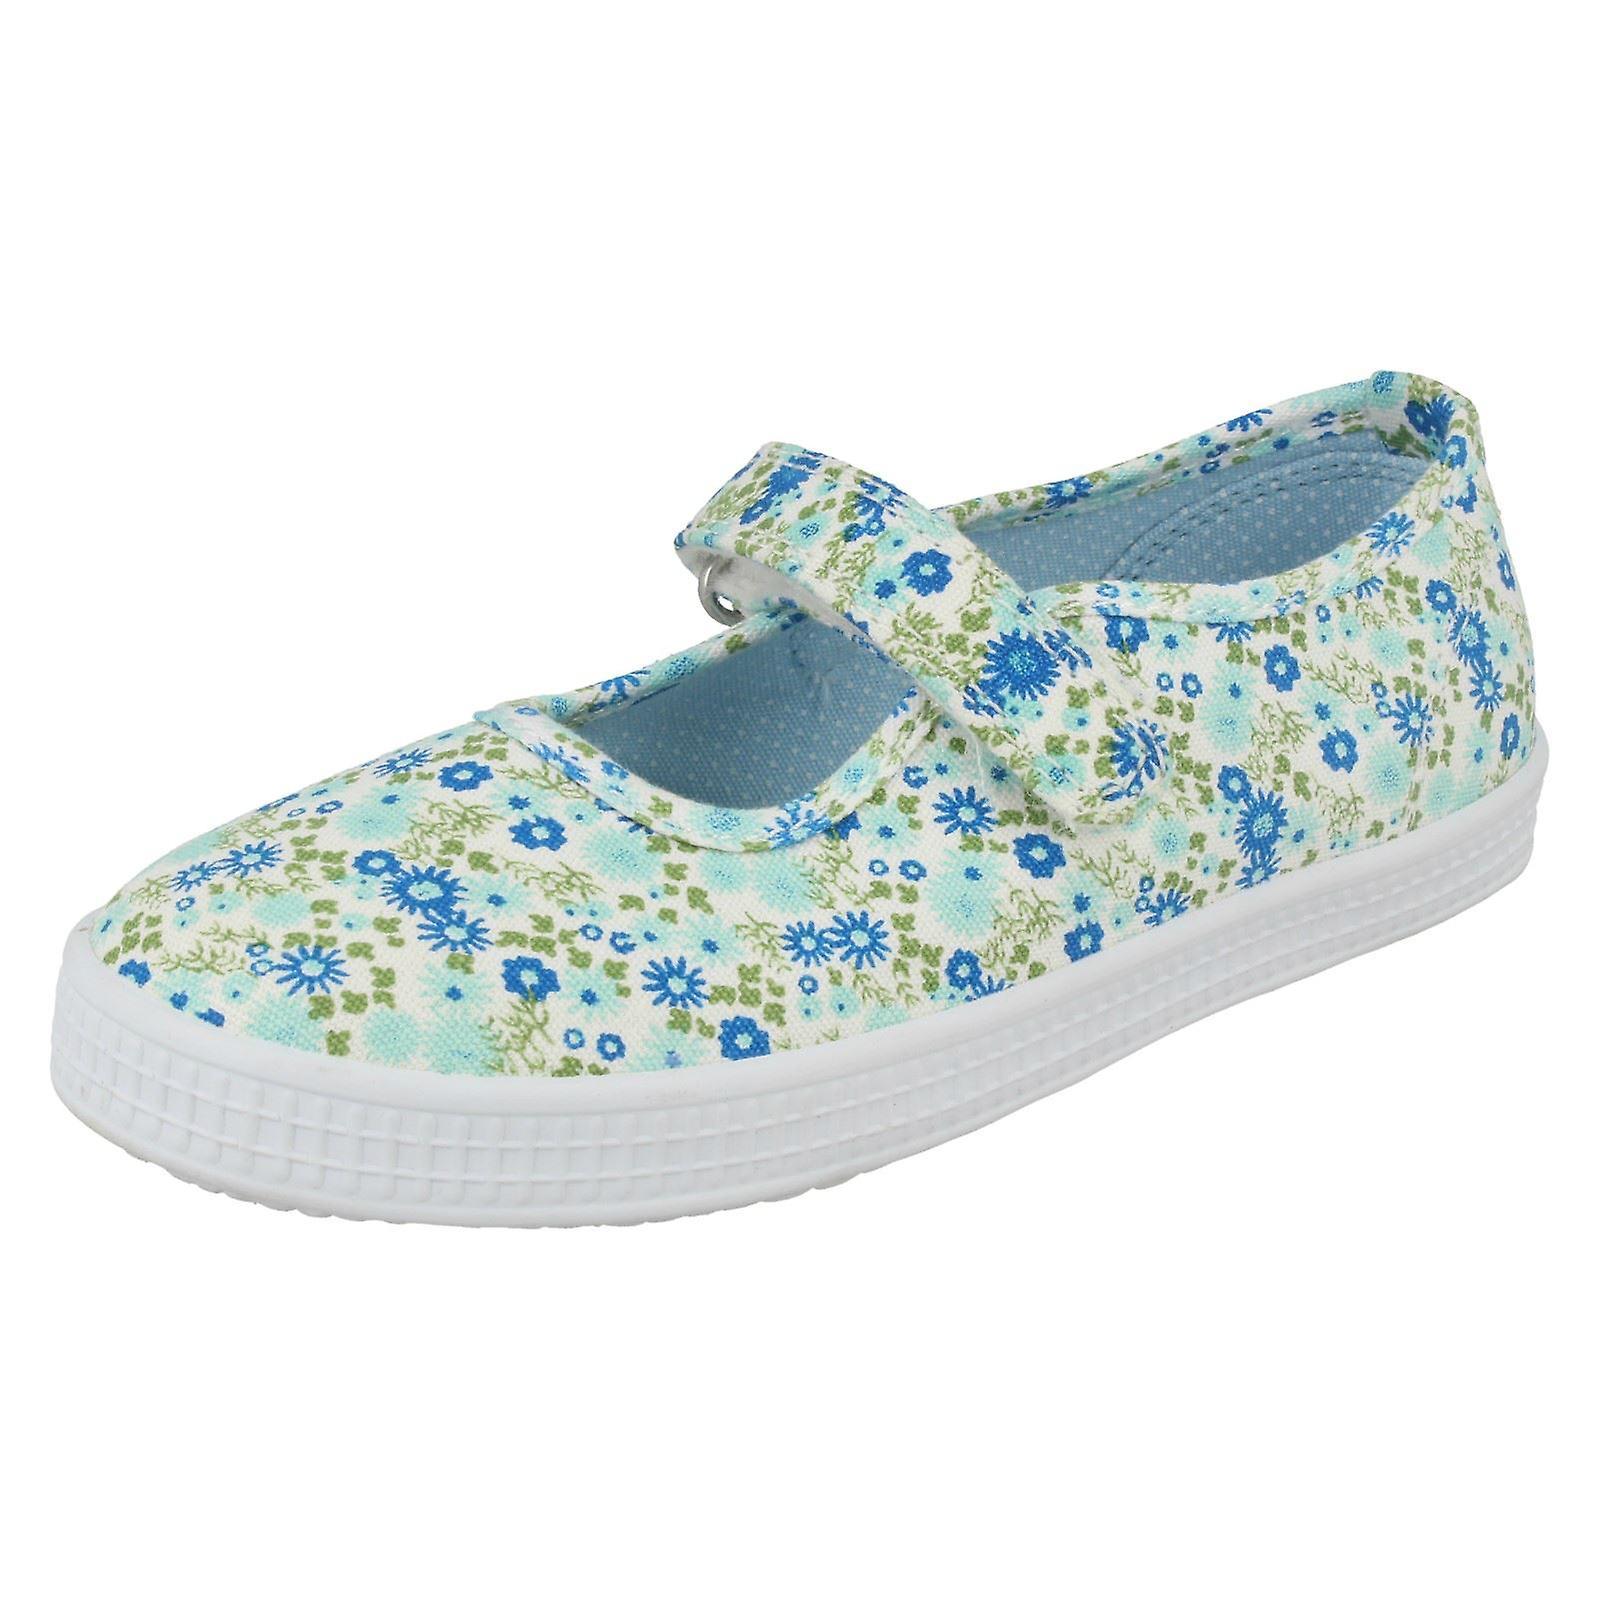 Girls Casual Startrite Casual Girls Canvas Shoes Portofino:Structured Fashion:Man's/Woman's b680cc